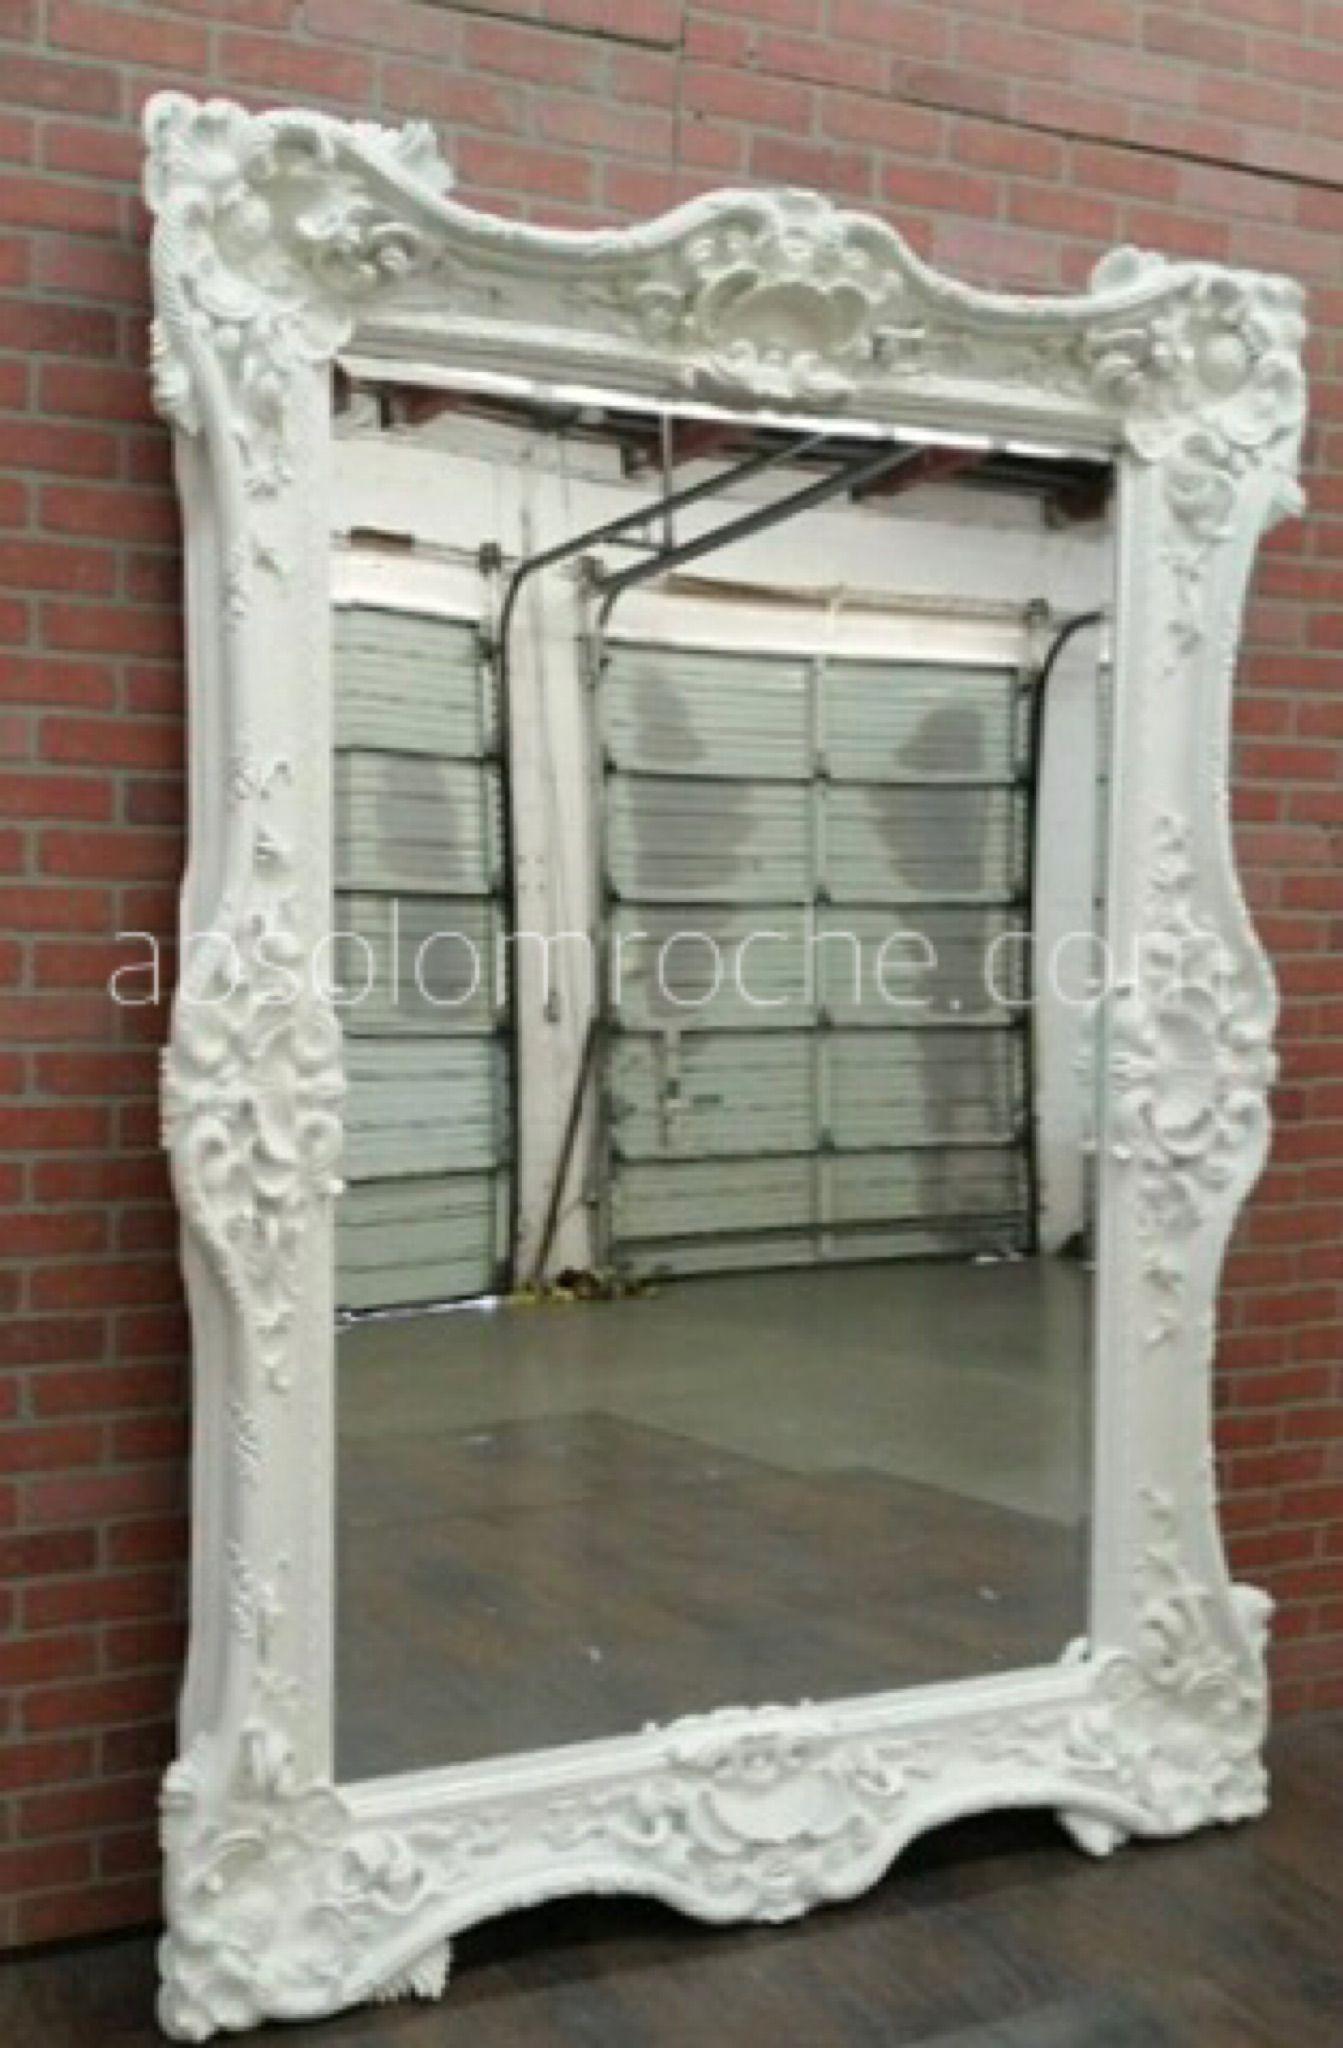 Absolom Roche Mirror (92 X 66)  Metallic Silver